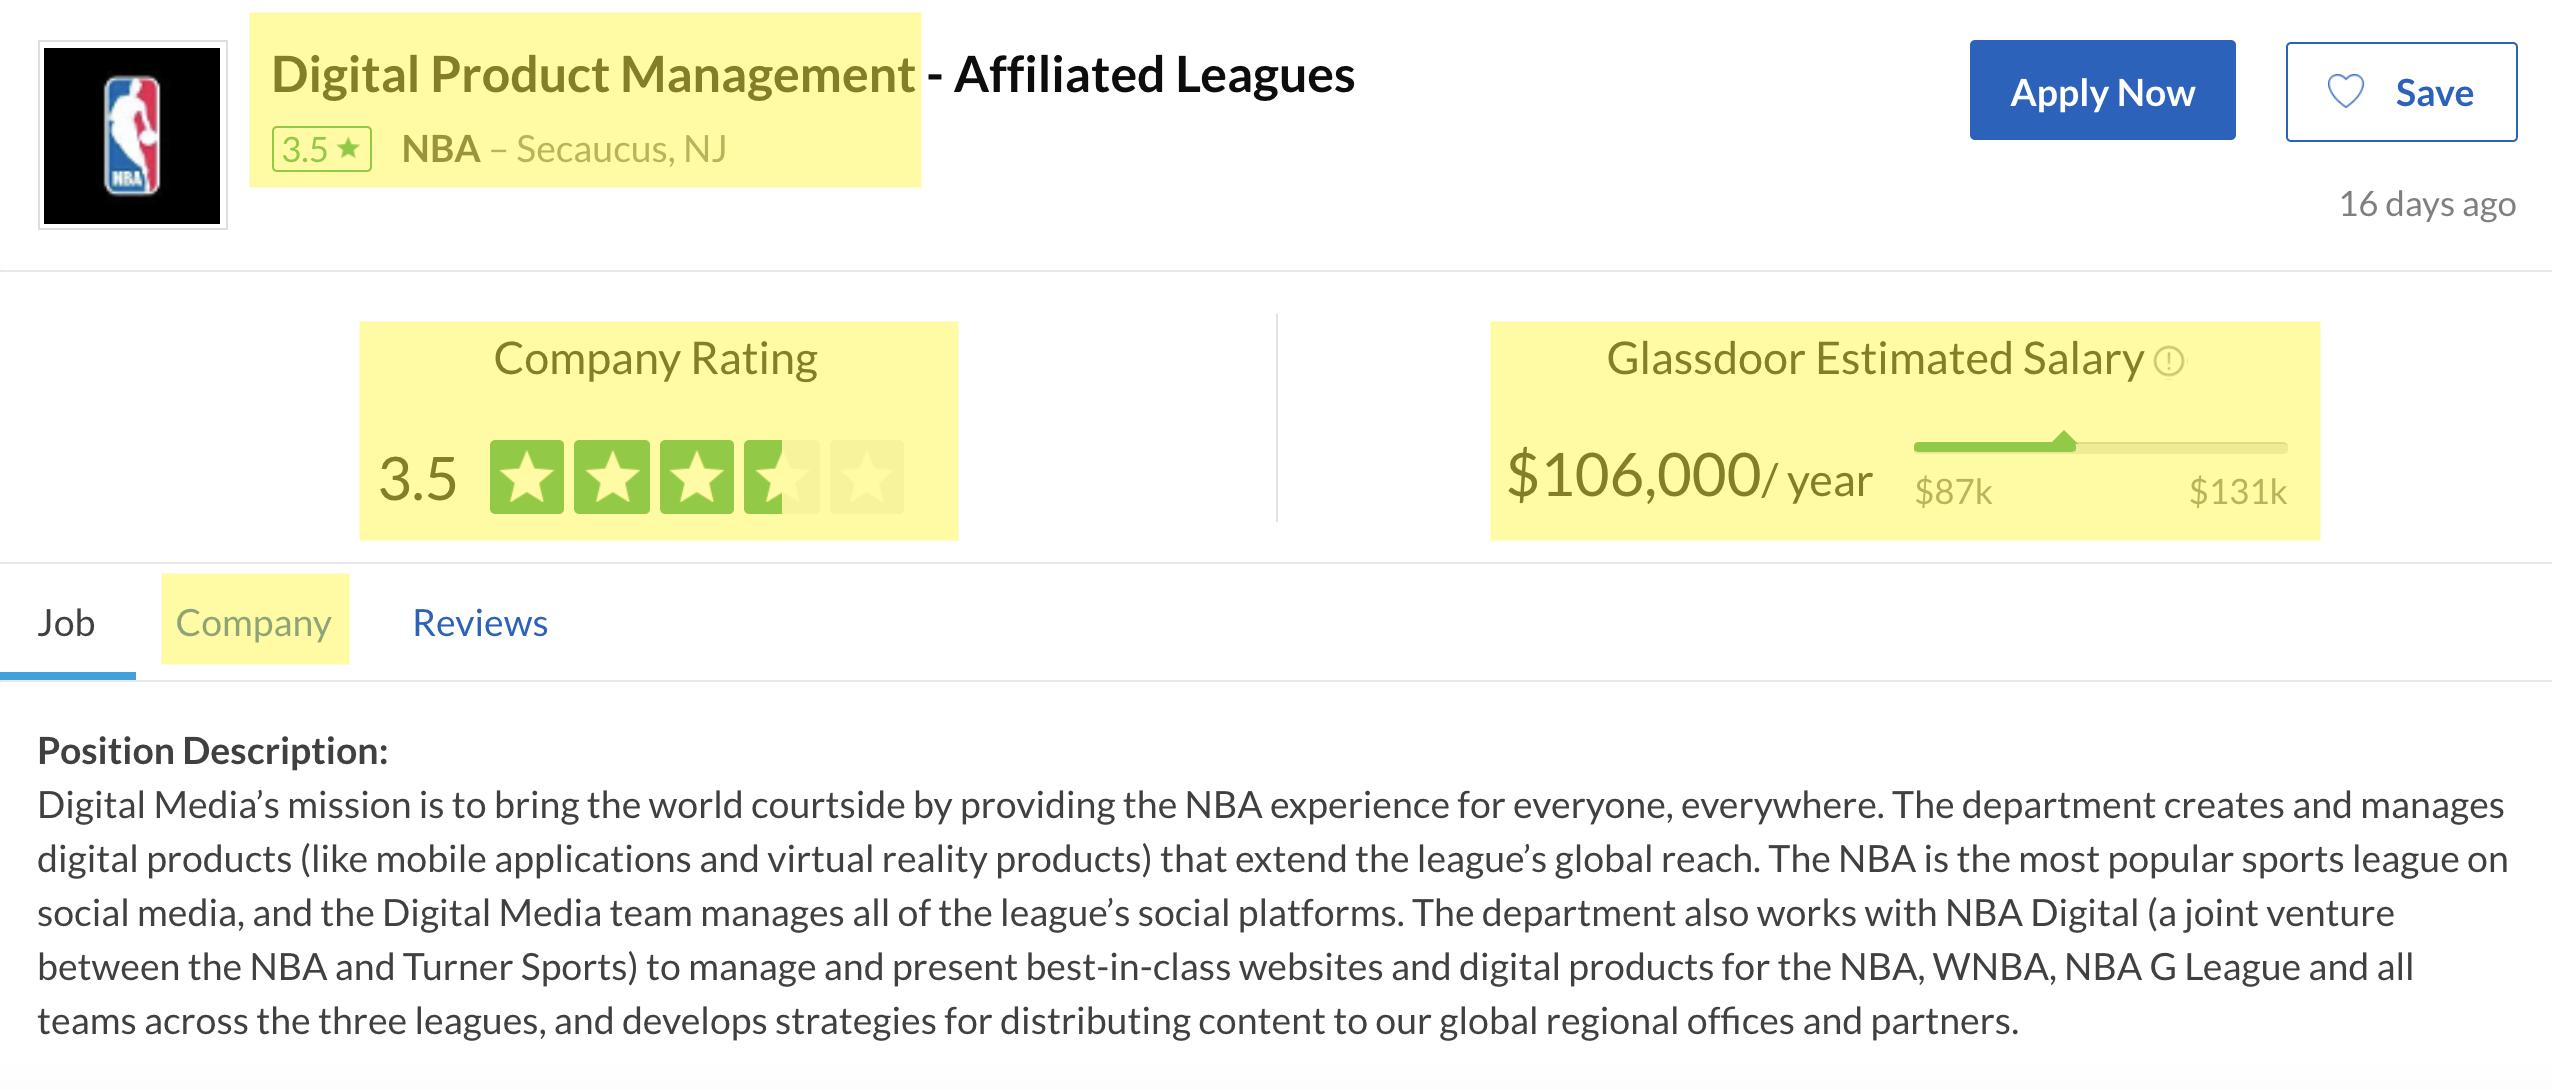 Glassdoor Industry Salary | NYC Data Science Academy Blog